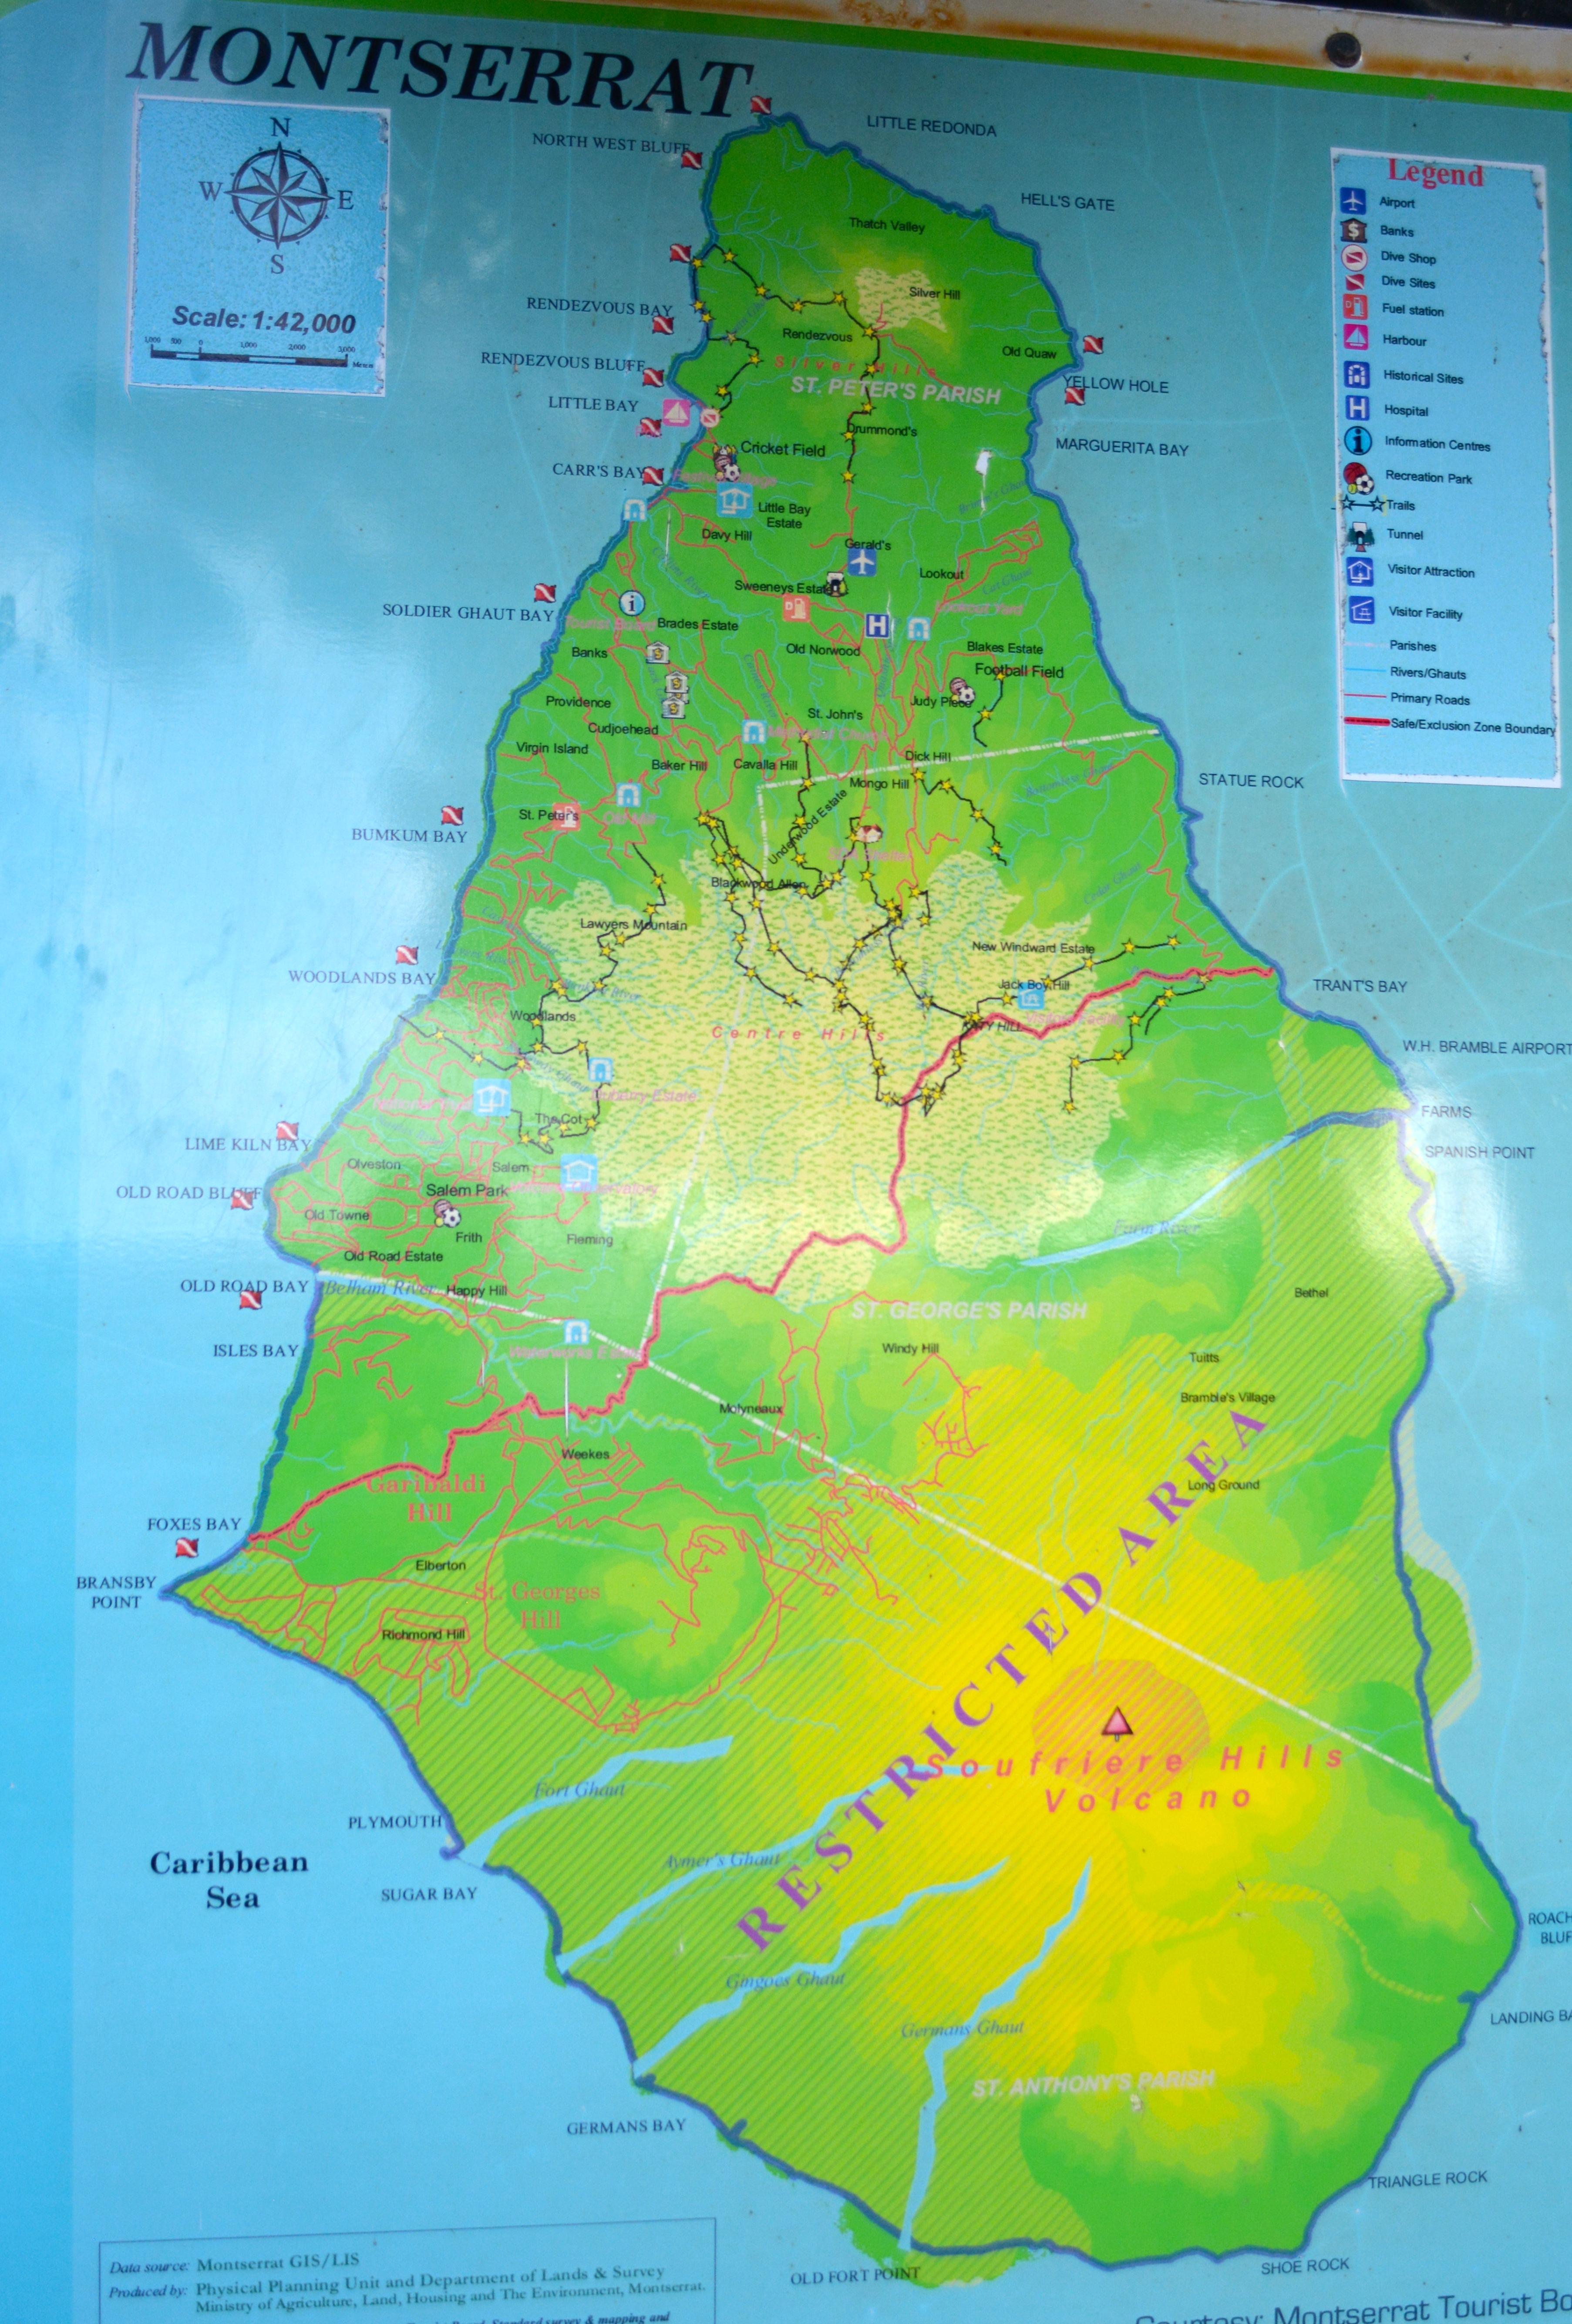 Montserrat Map Sailing On Neko - Montserrat map